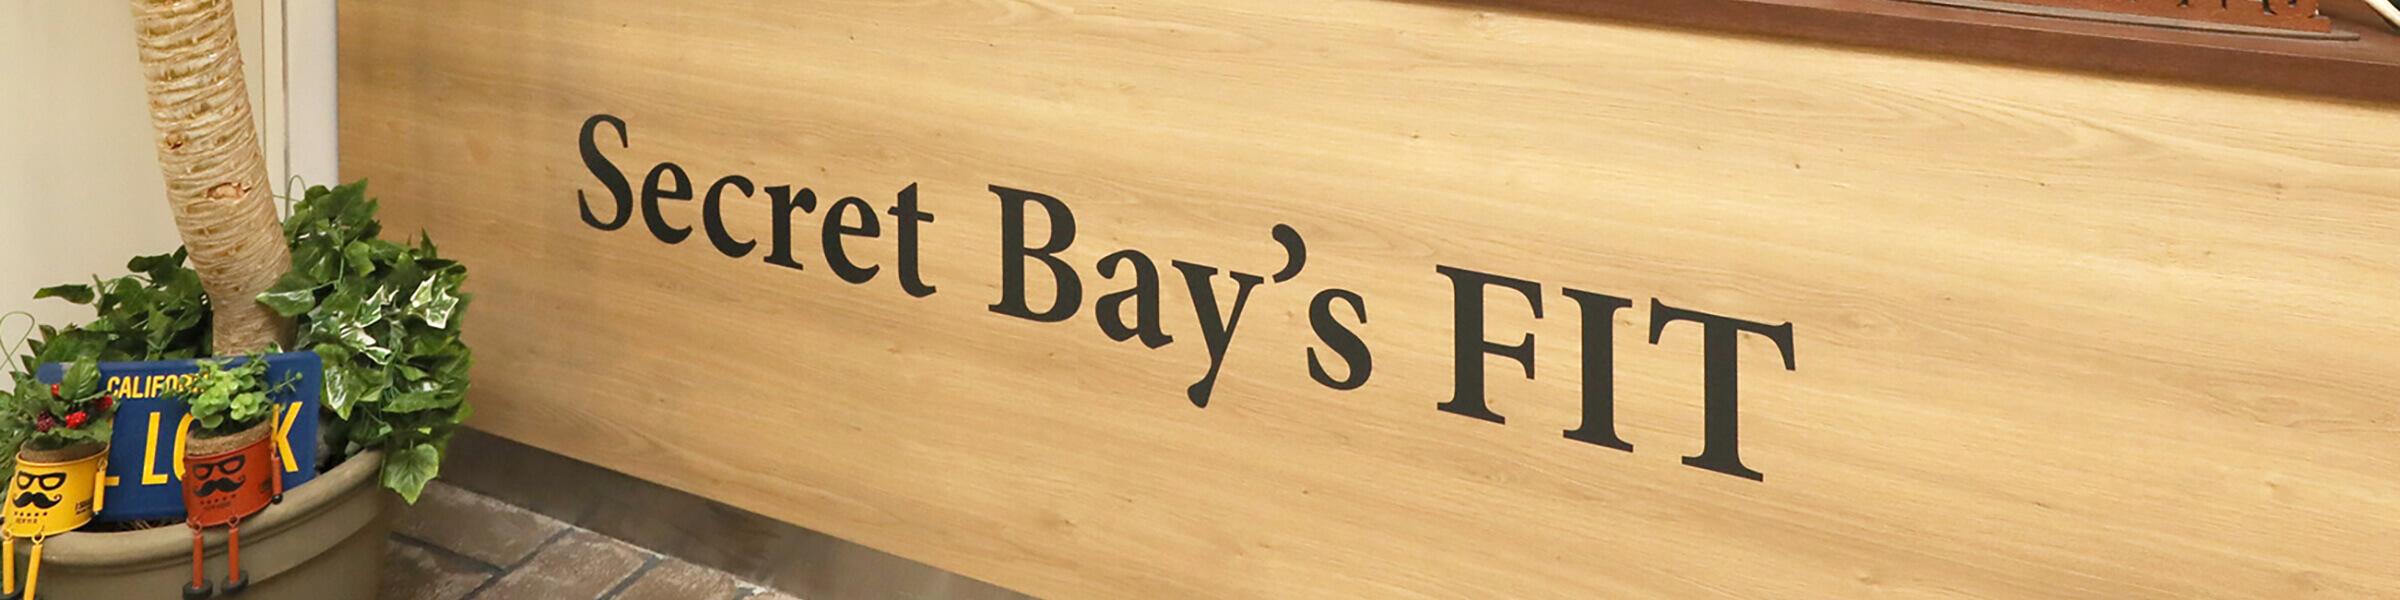 Secret Bay's FIT